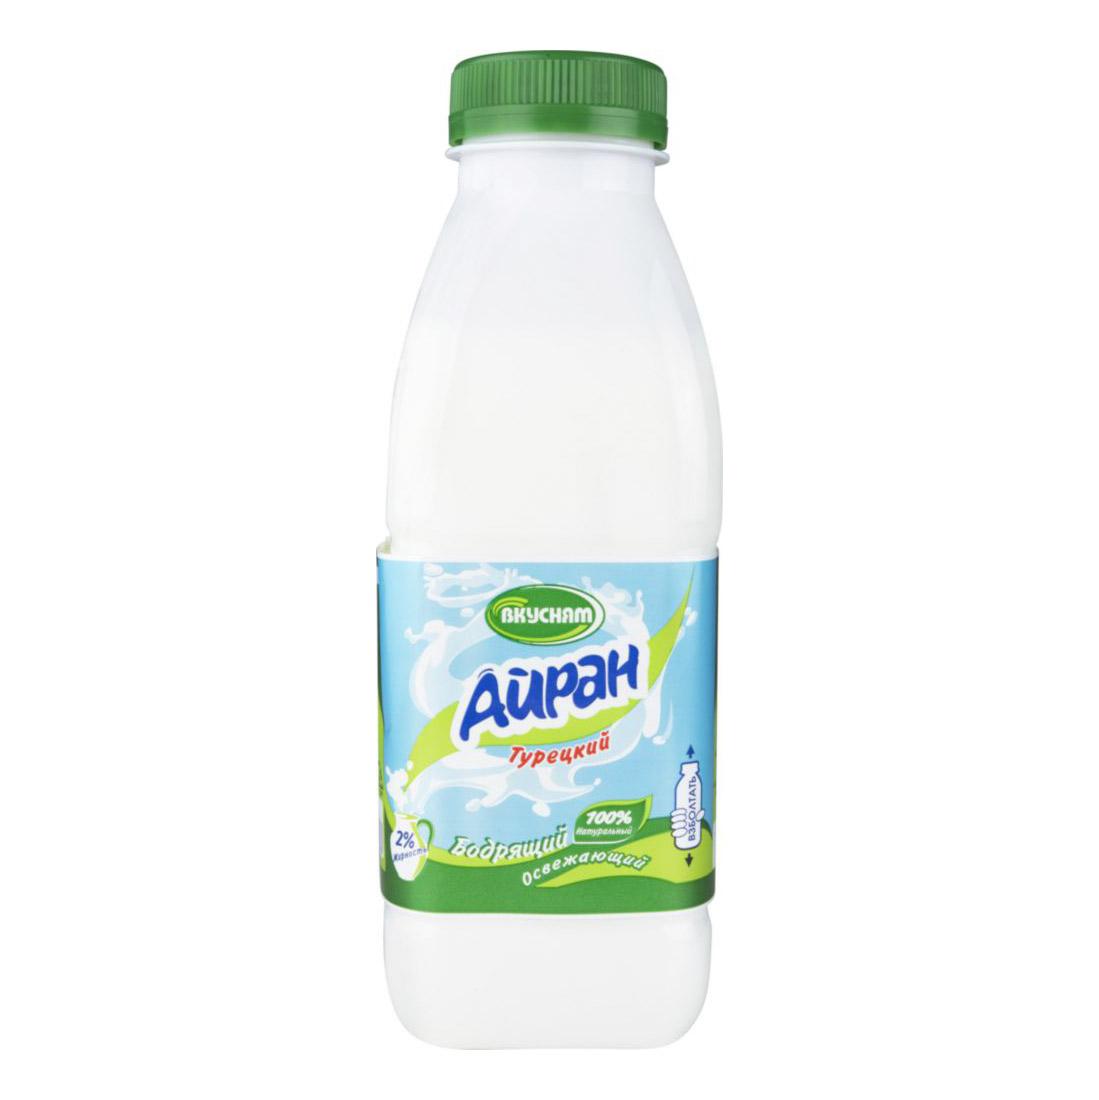 Напиток кисломолочный Айран турецкий Вкусням 2% 450 г недорого